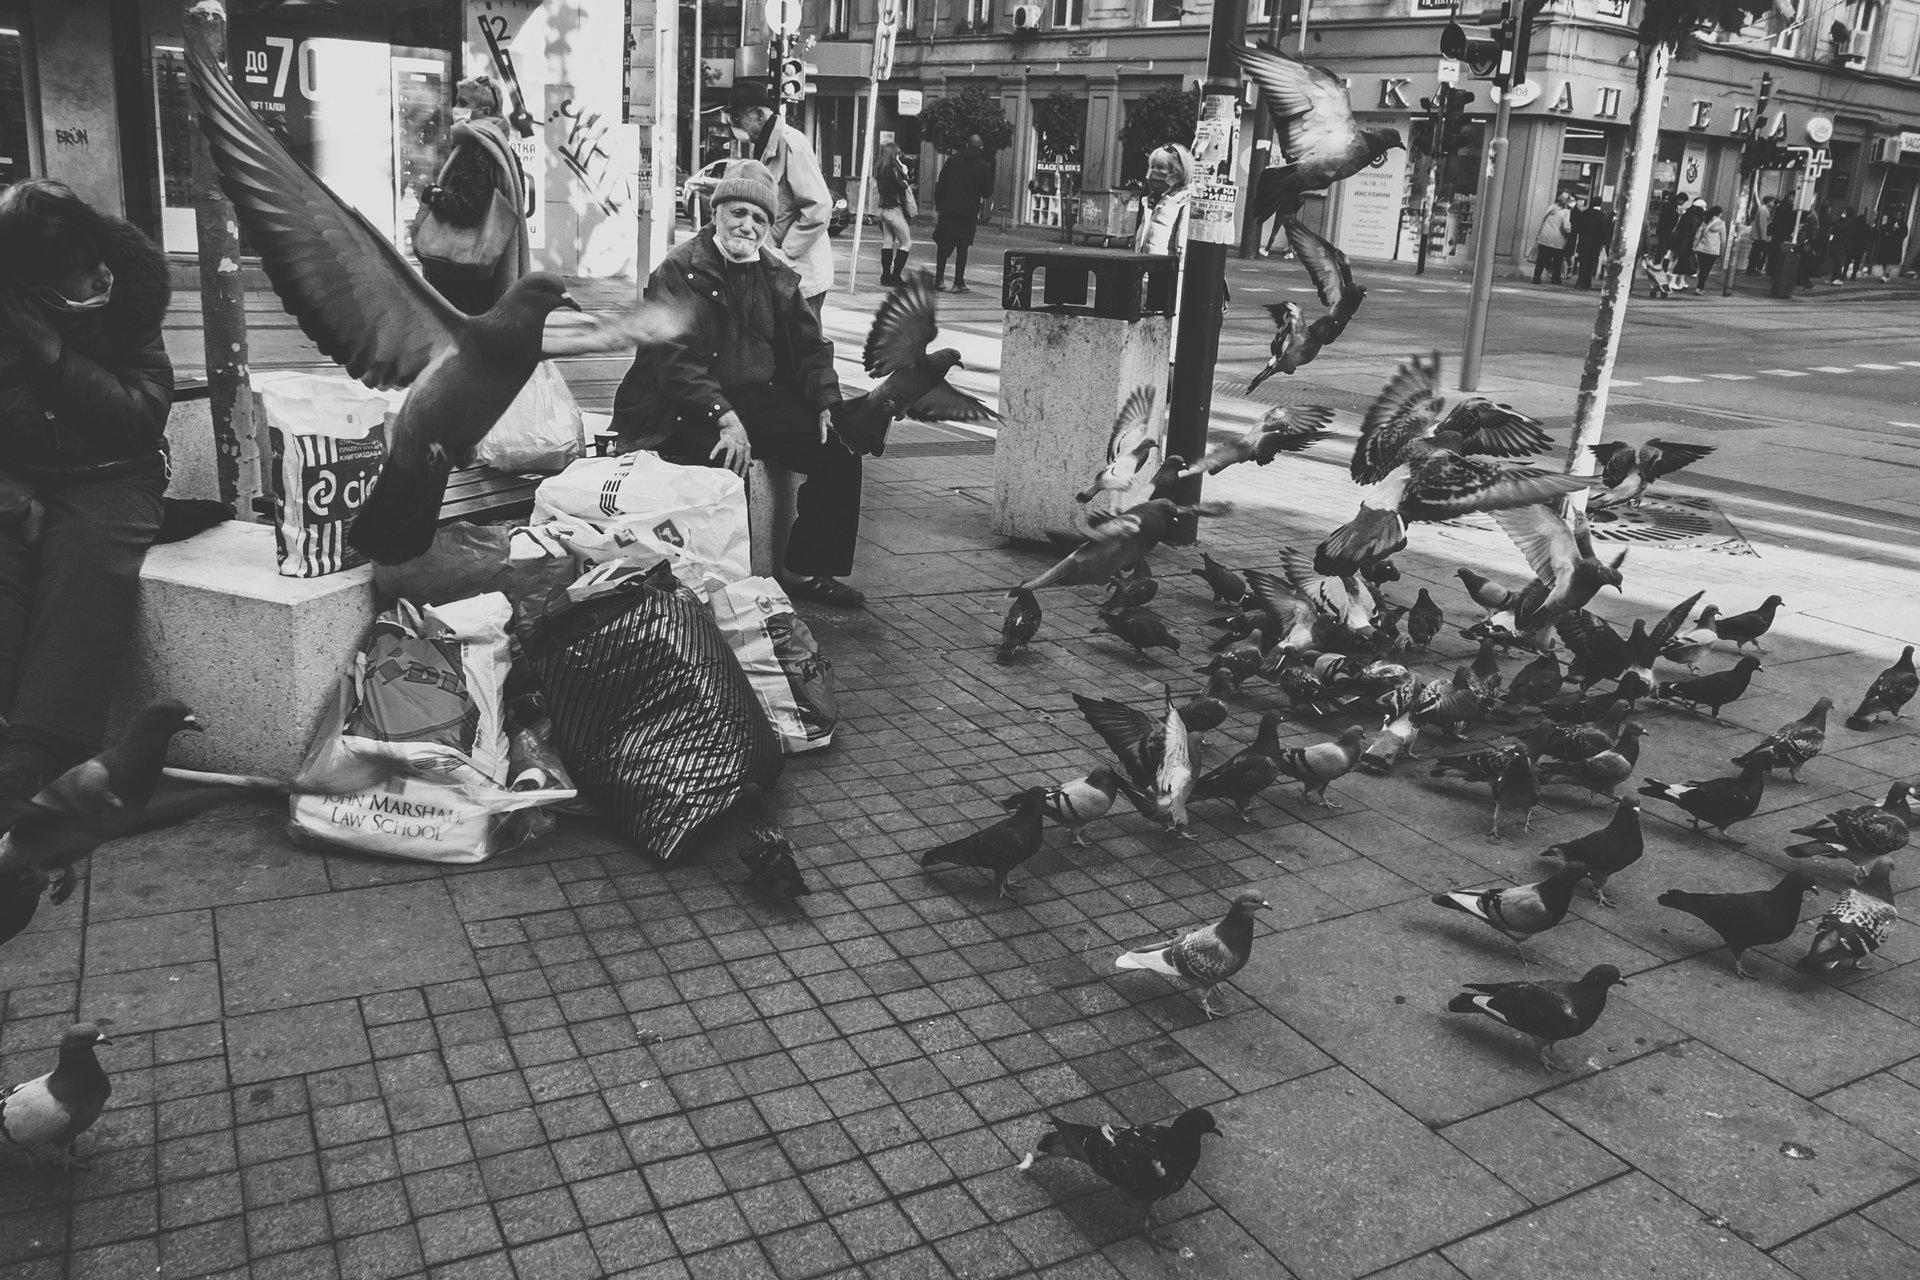 Photo in Street | Author dream_catcher | PHOTO FORUM